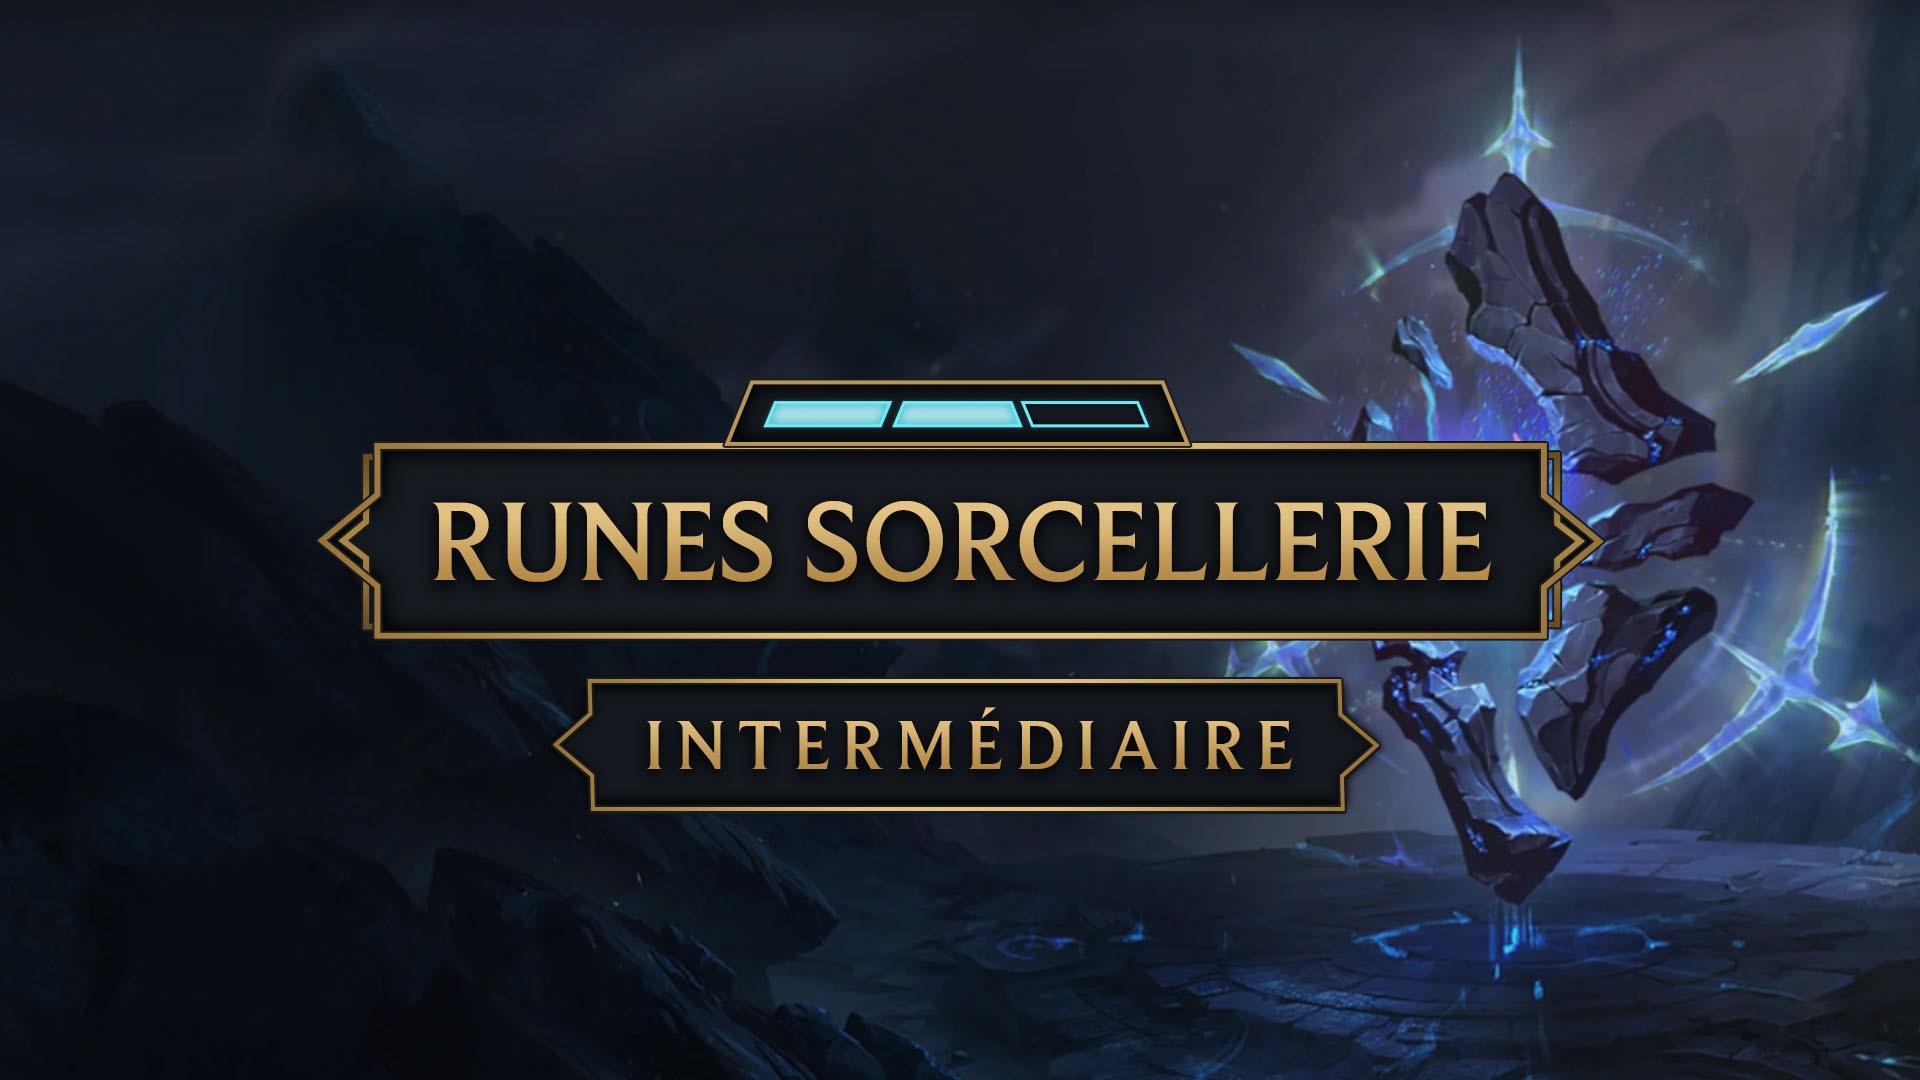 Runes sorcellerie 1